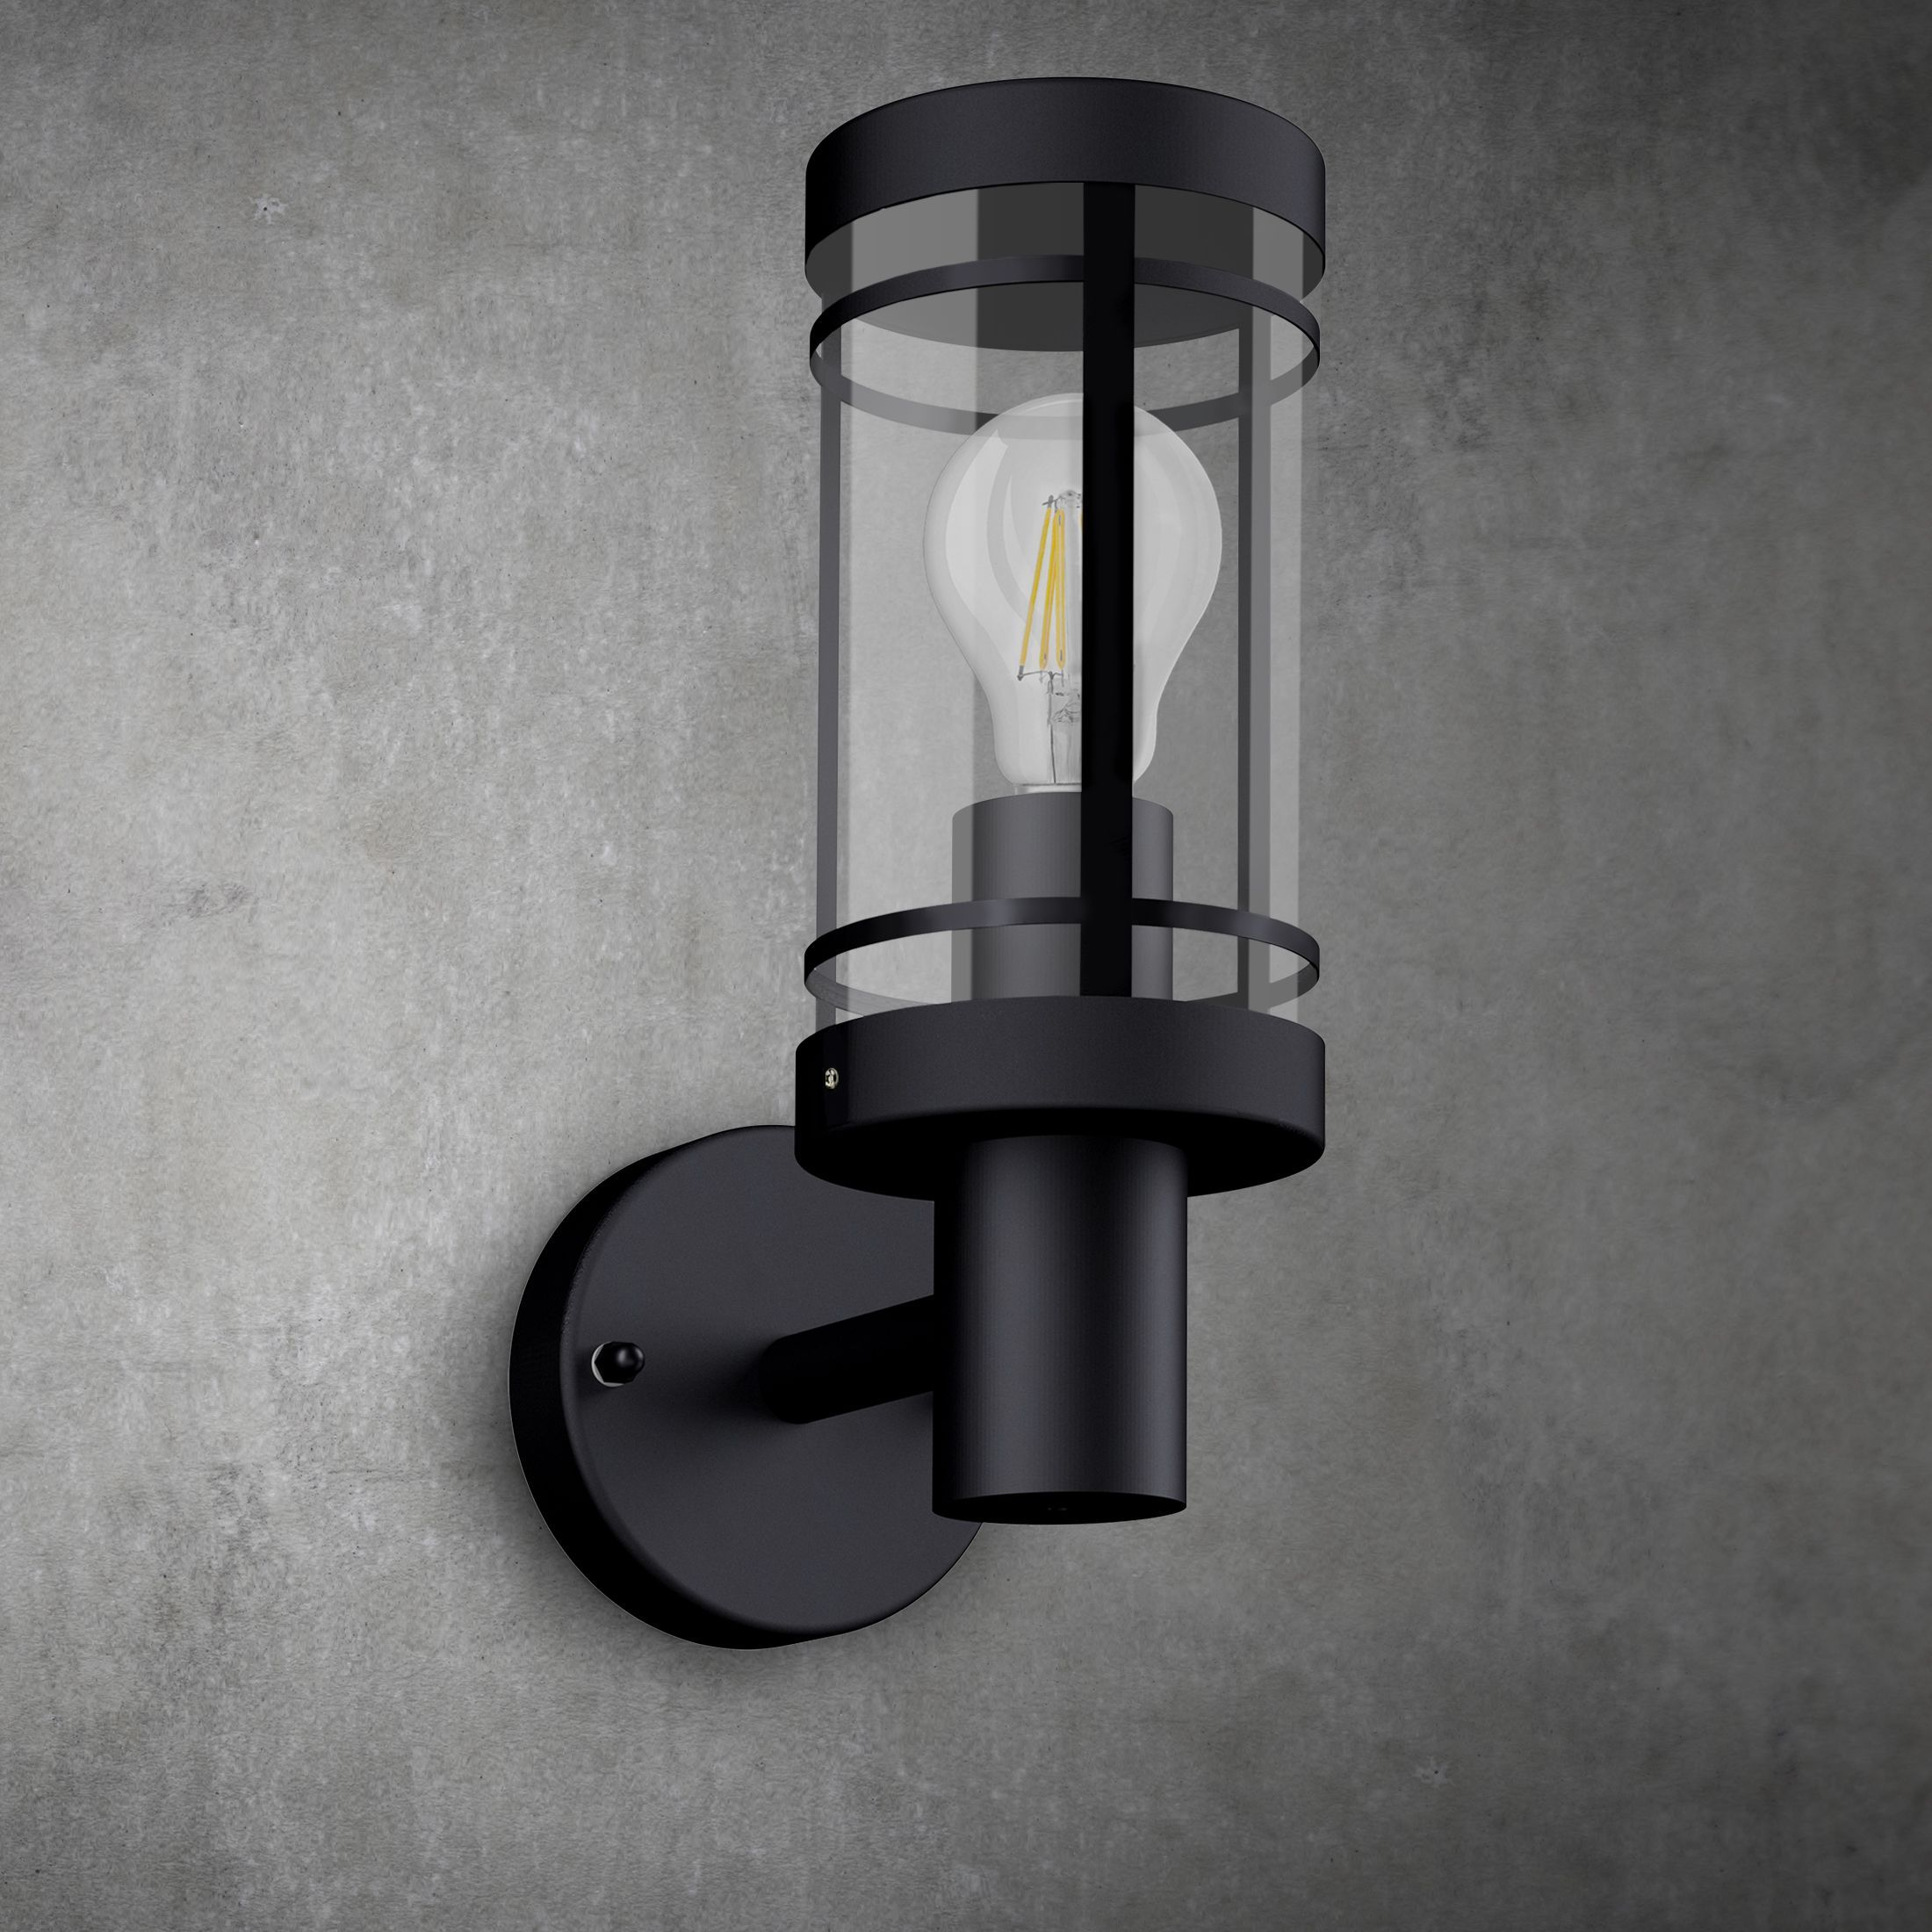 Badezimmerlampen Led Ip44